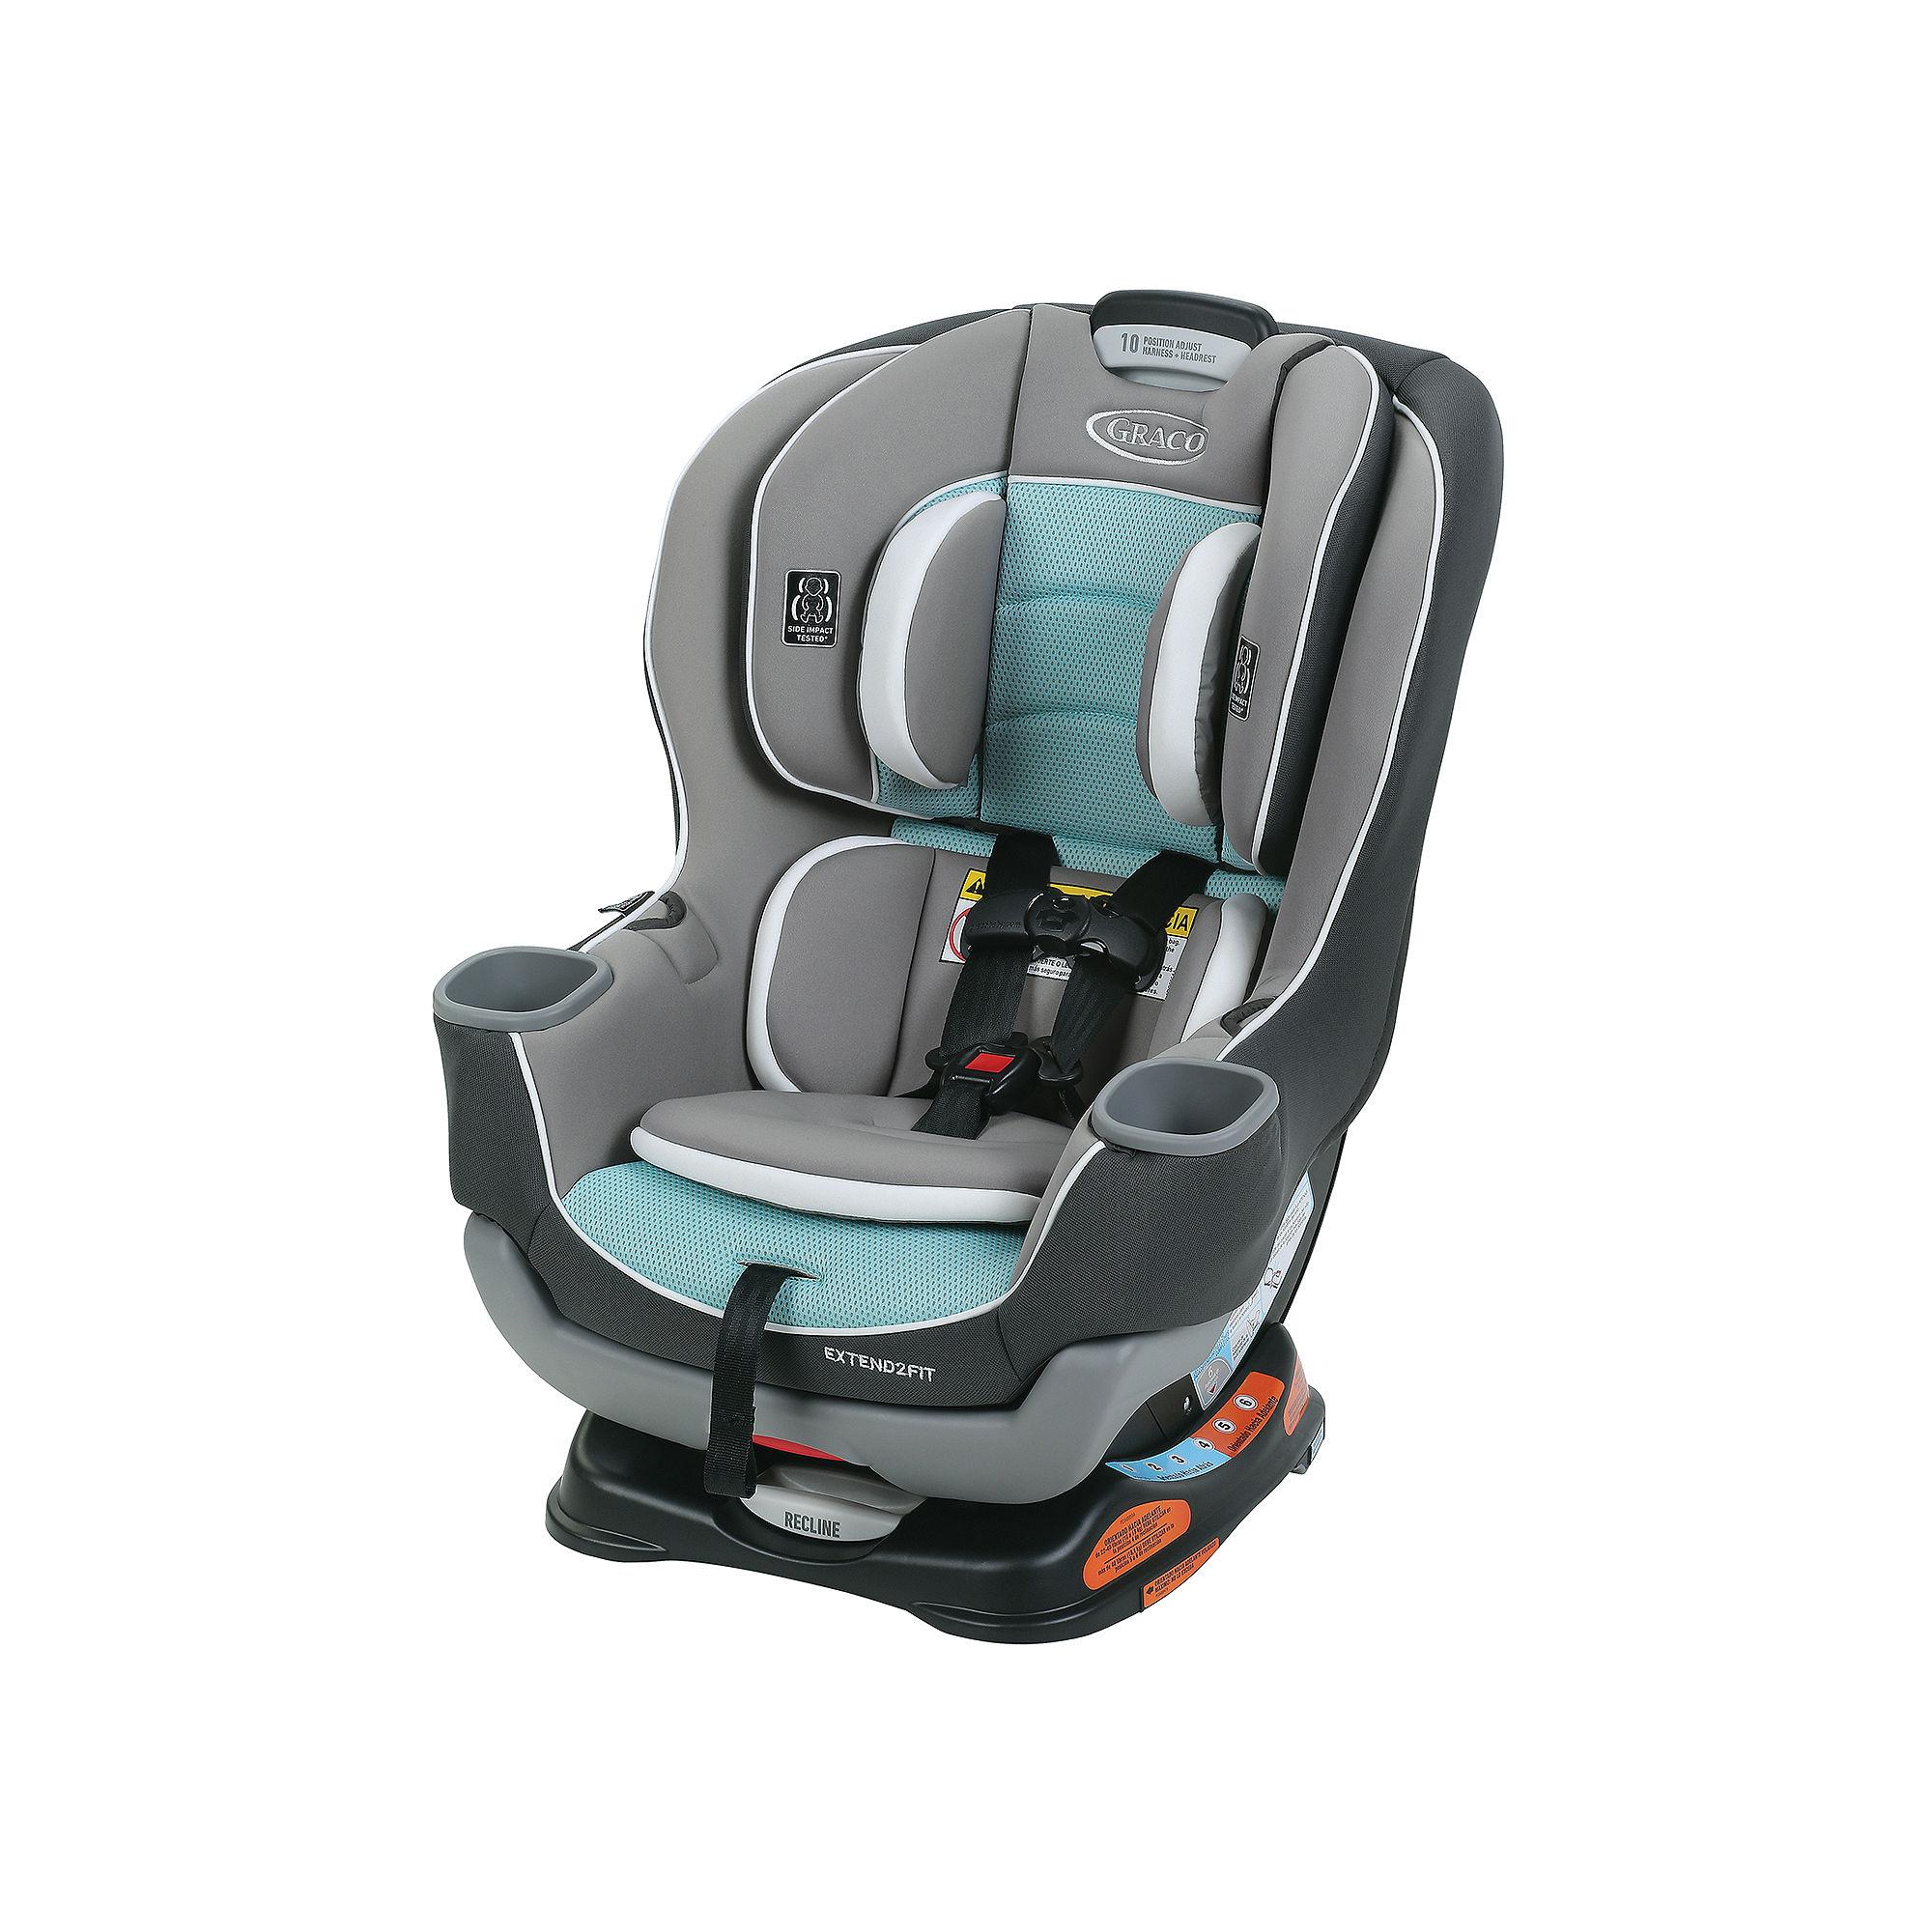 deals graco nautilus 80 elite 3 in 1 car seat azalea offer cheap car seat. Black Bedroom Furniture Sets. Home Design Ideas